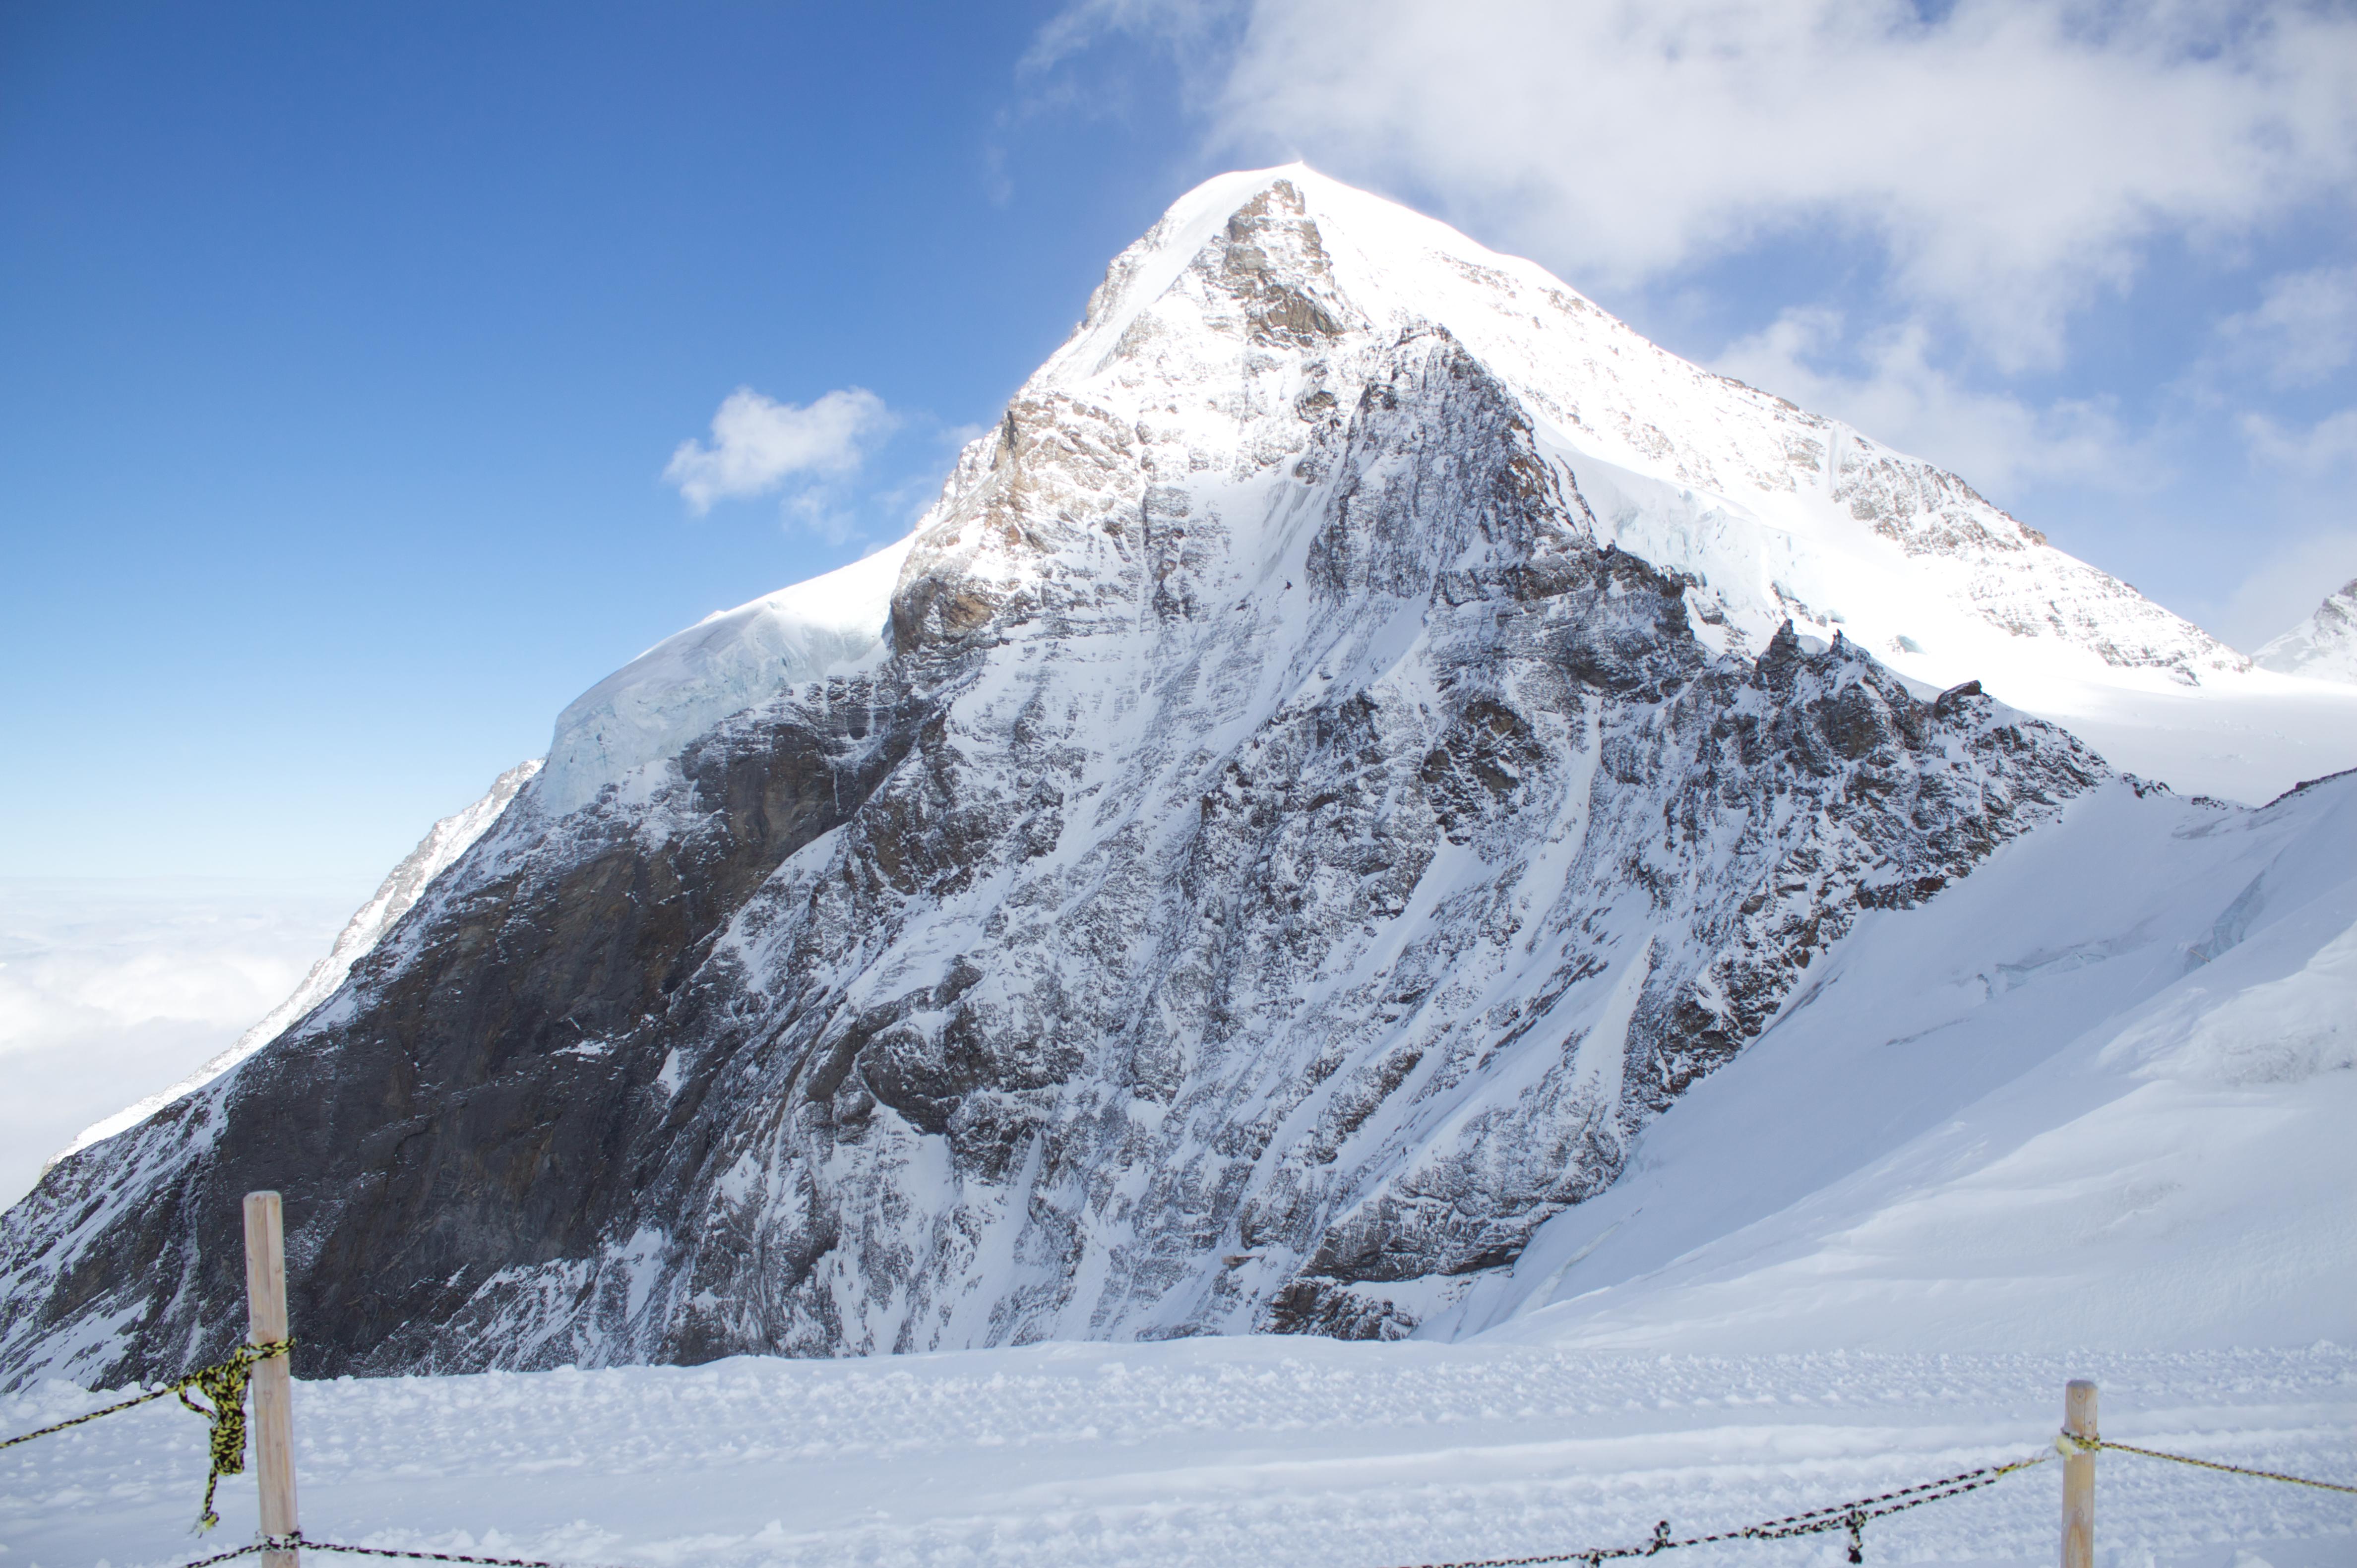 File:Jungfrau, Swiss Alps - 20100218.jpg - Wikimedia Commons